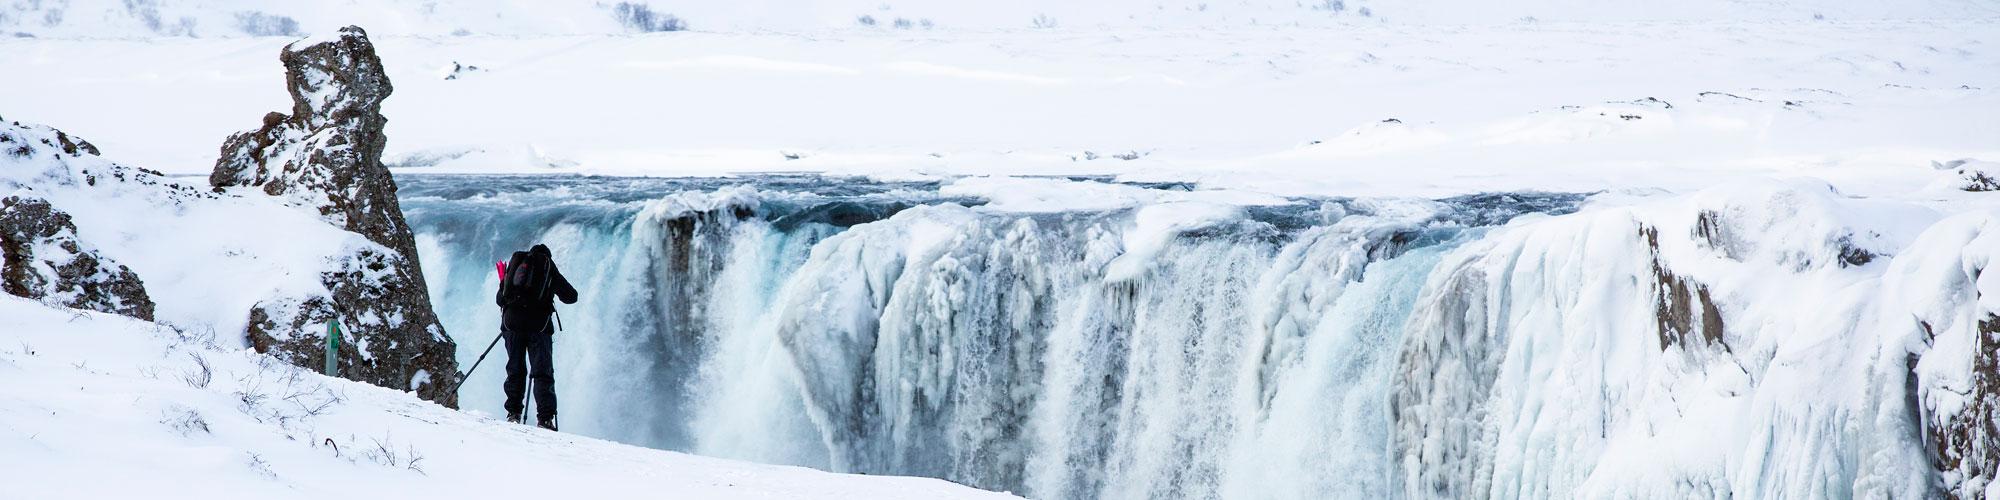 ©Theo Bosboom - Noord-IJsland